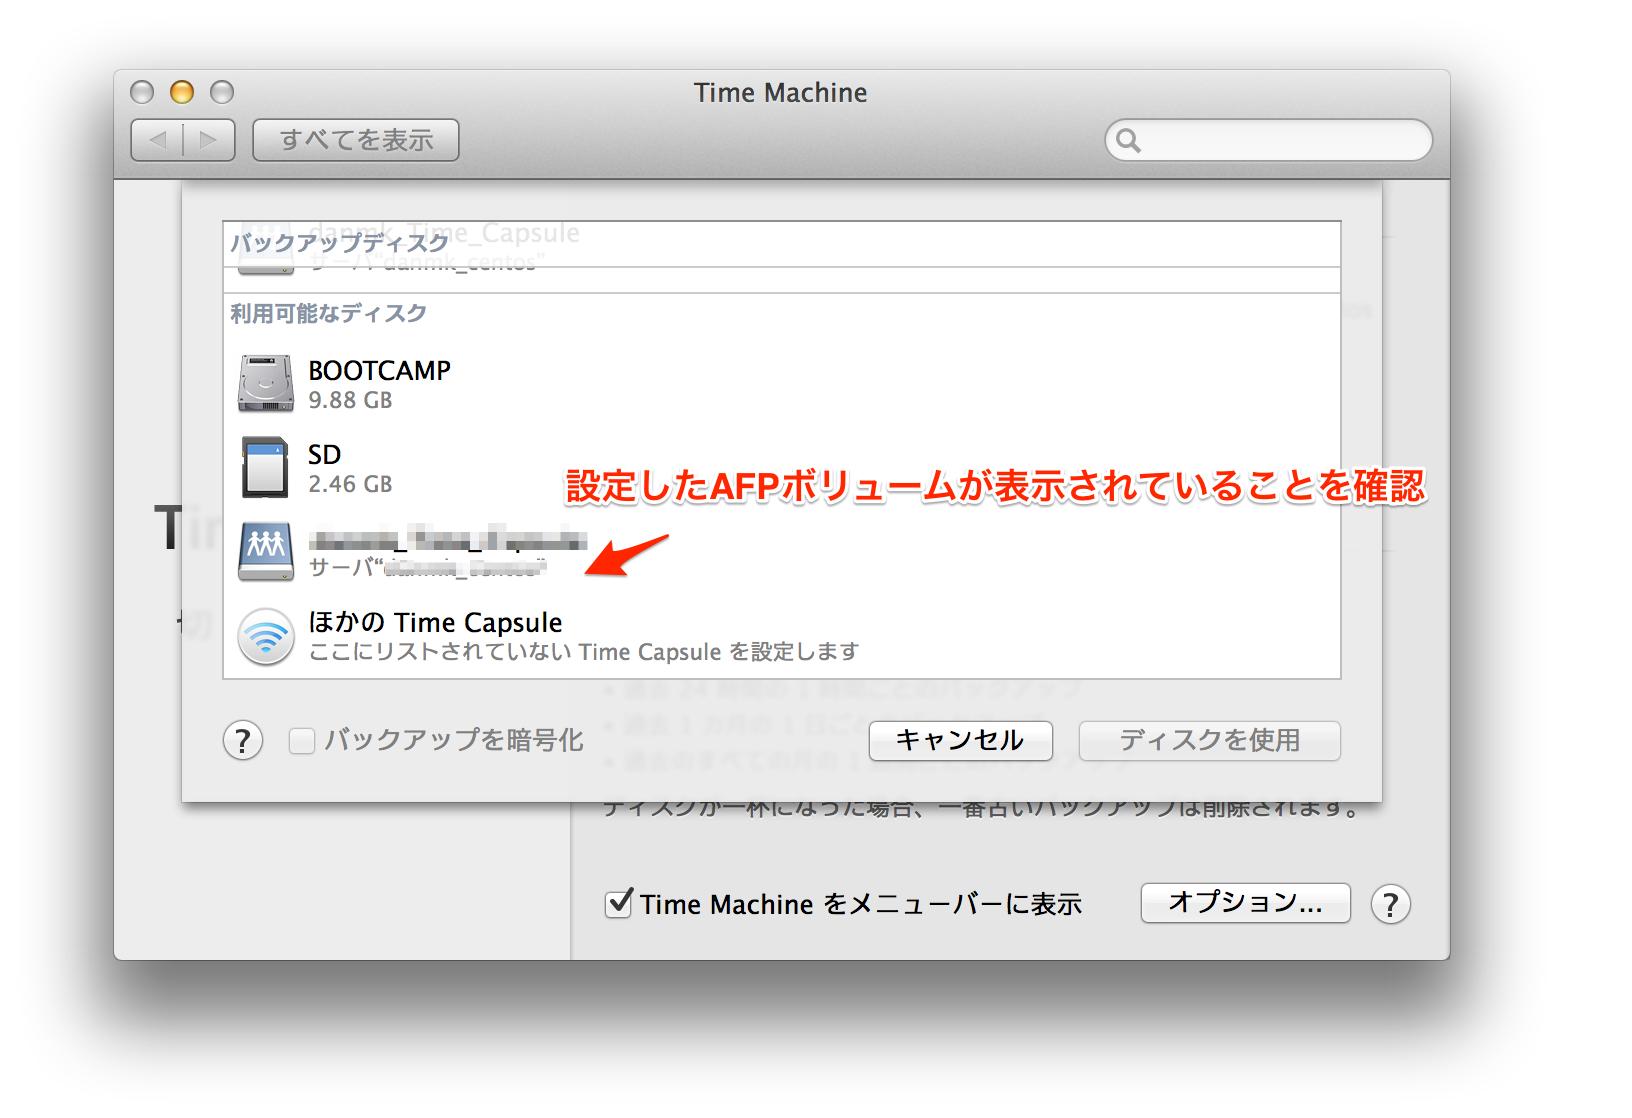 netatalk_time_machine2